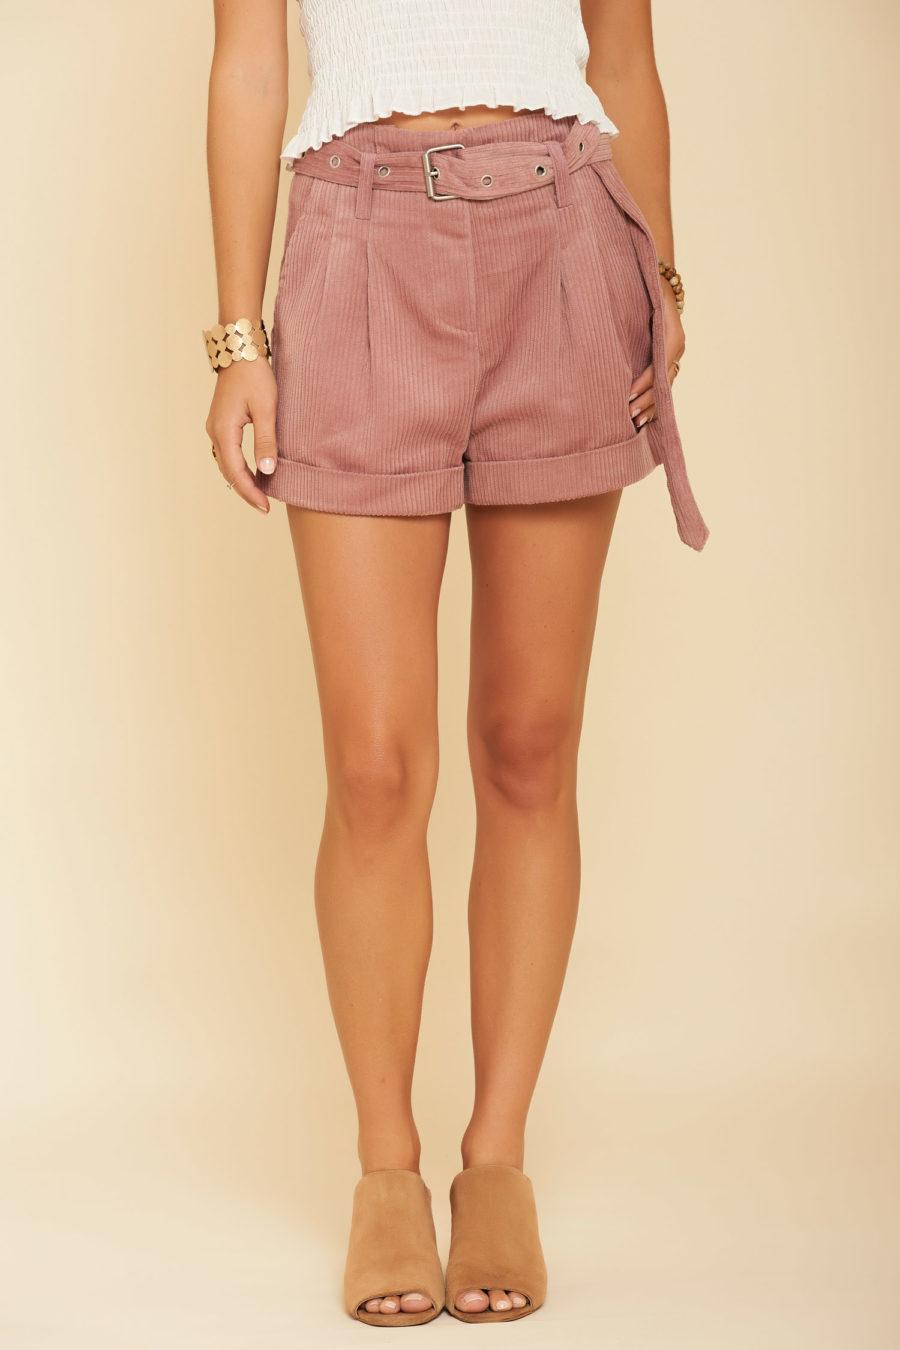 School Girl Chic Corduroy Shorts